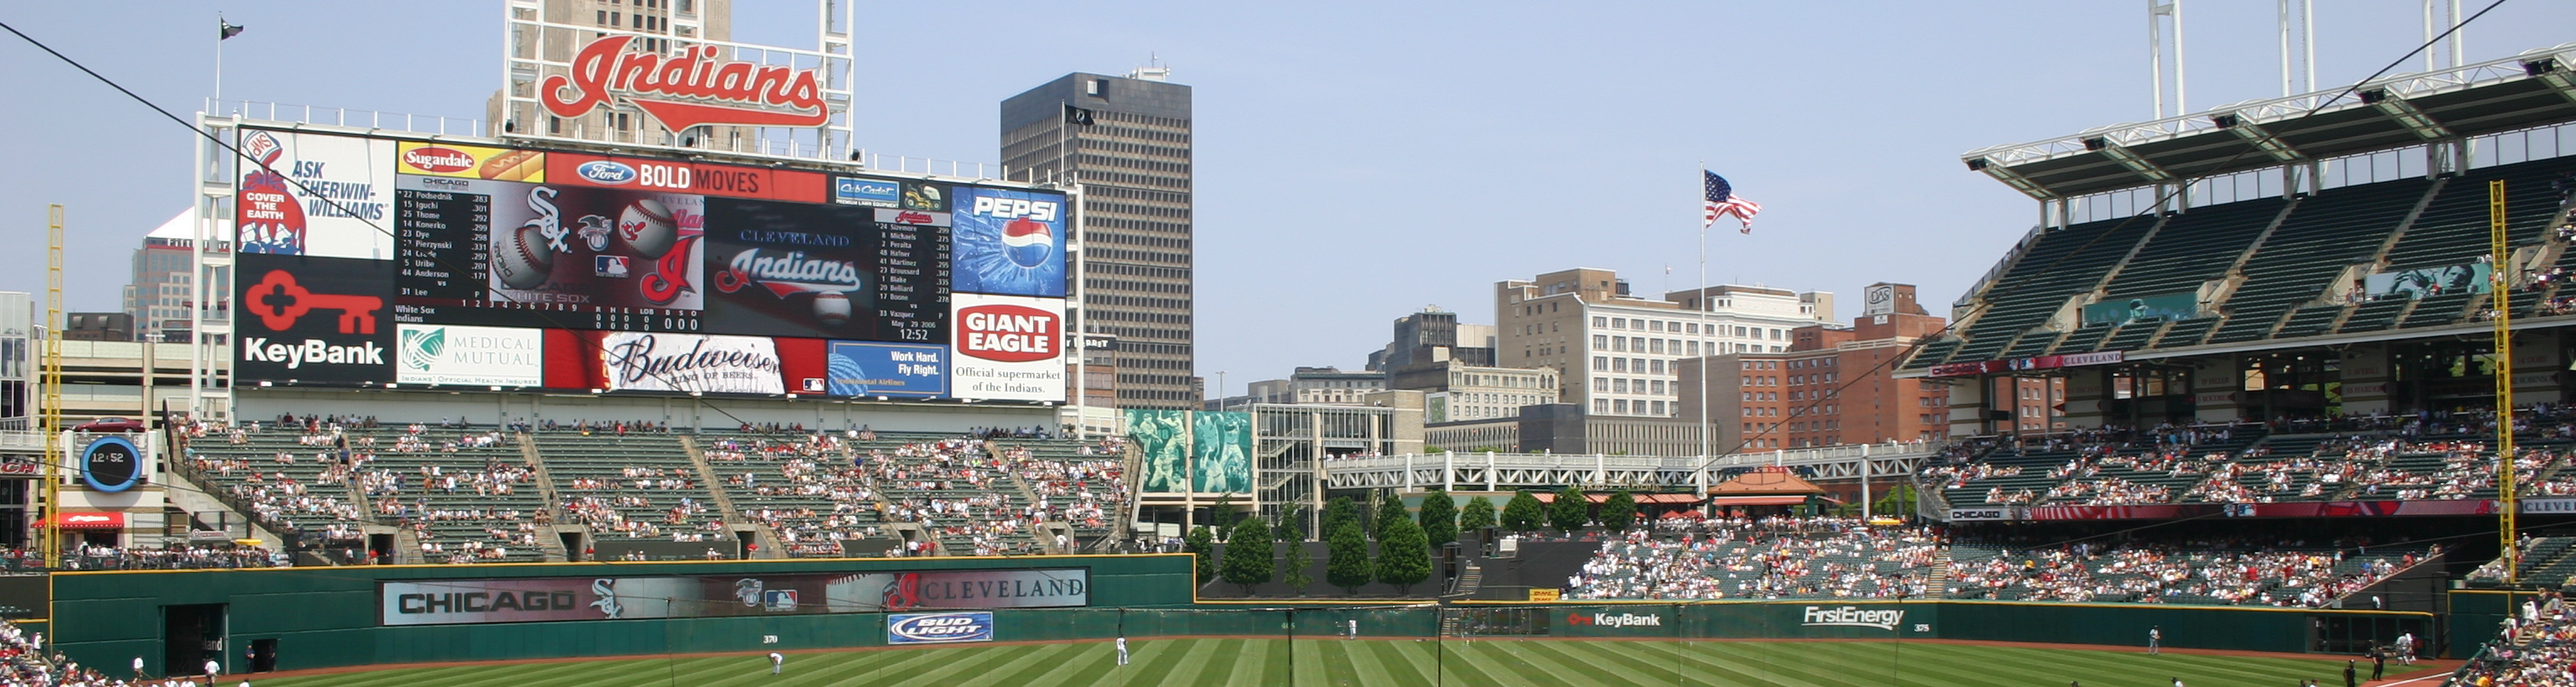 Progressive Field,baseball trips, baseball tours,sports travel and tours